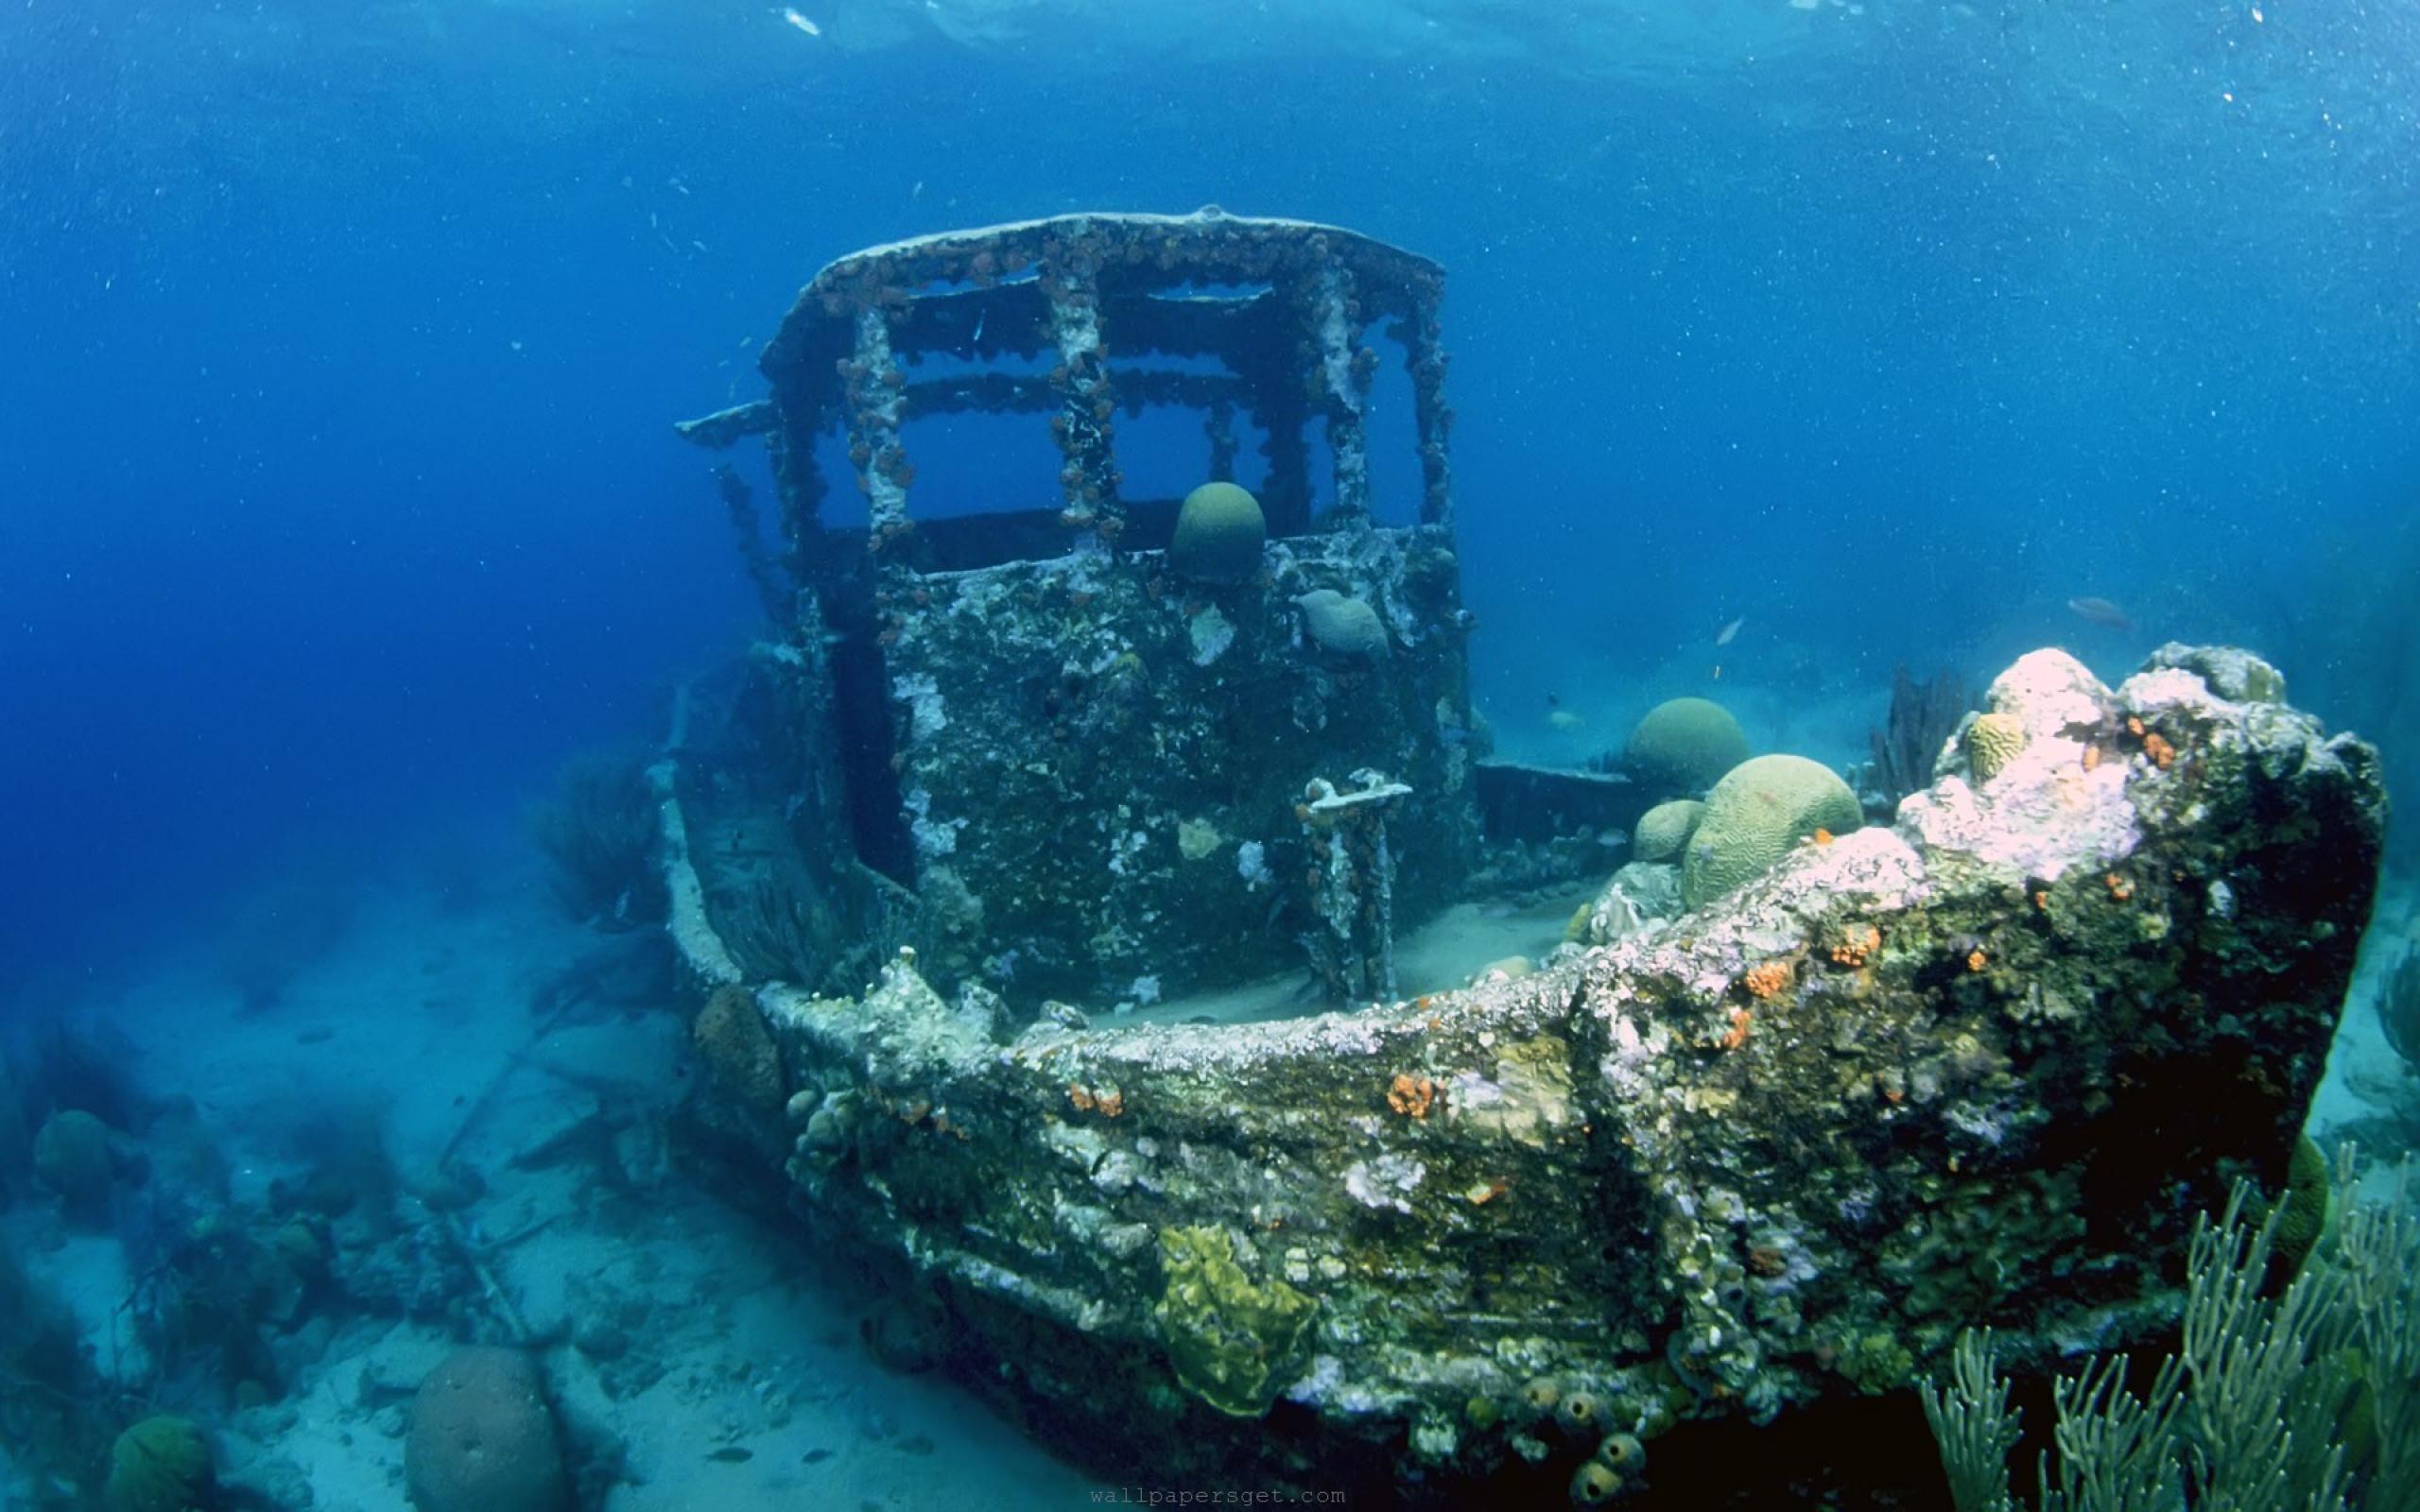 Wallpapers Coral Reefs Ship Seawater HD Widescreen